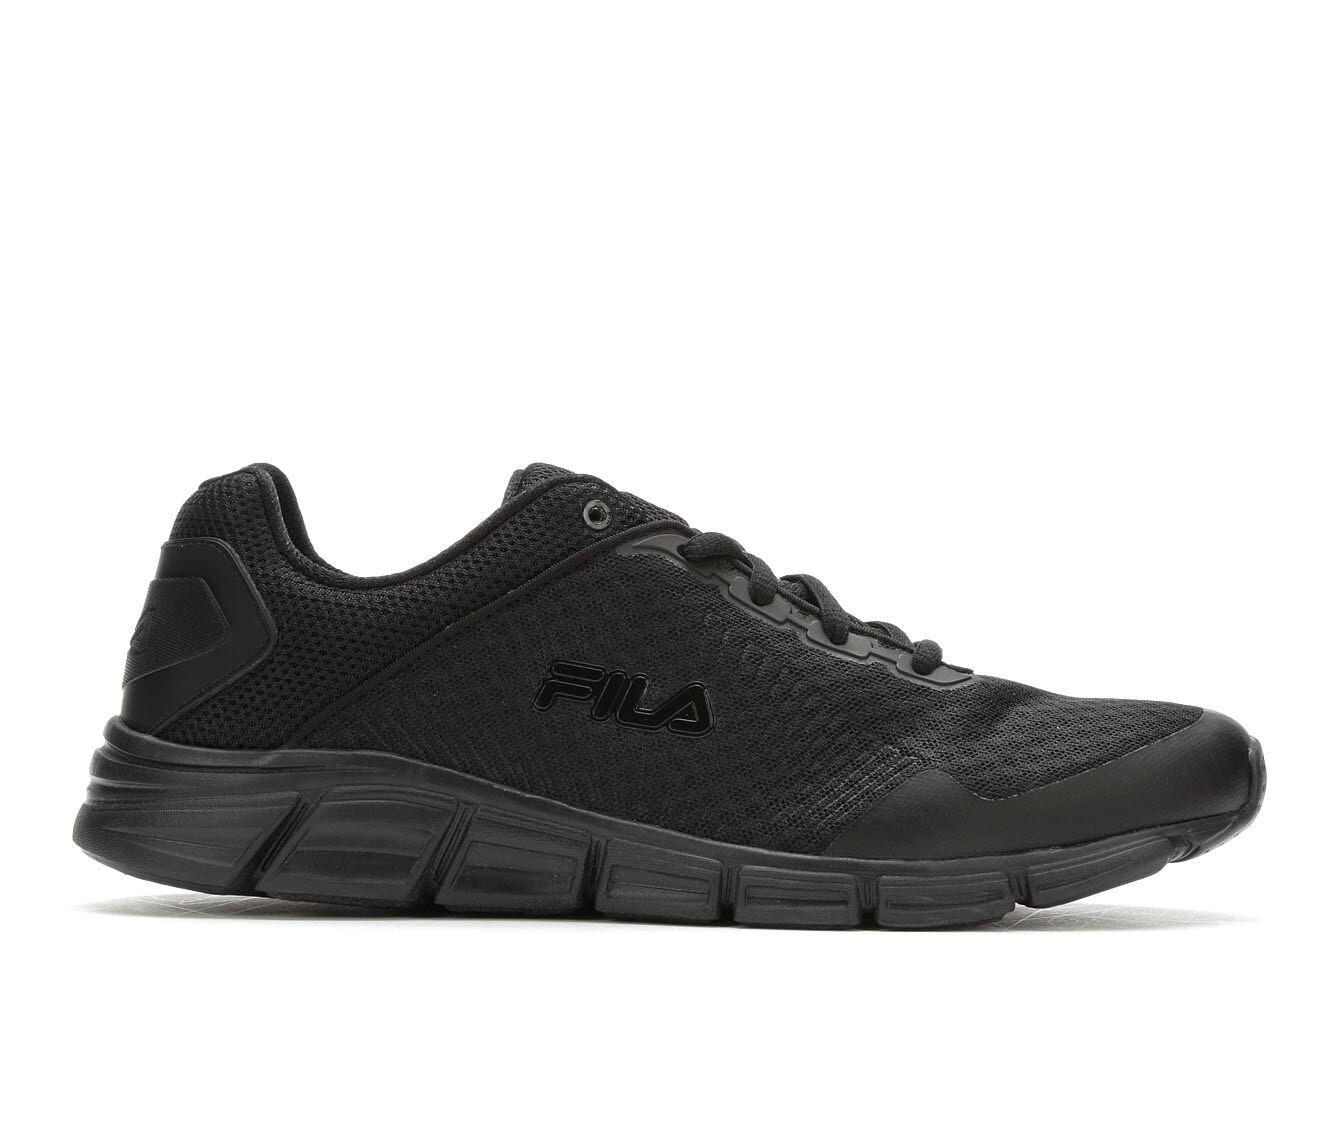 uk shoes_kd0998